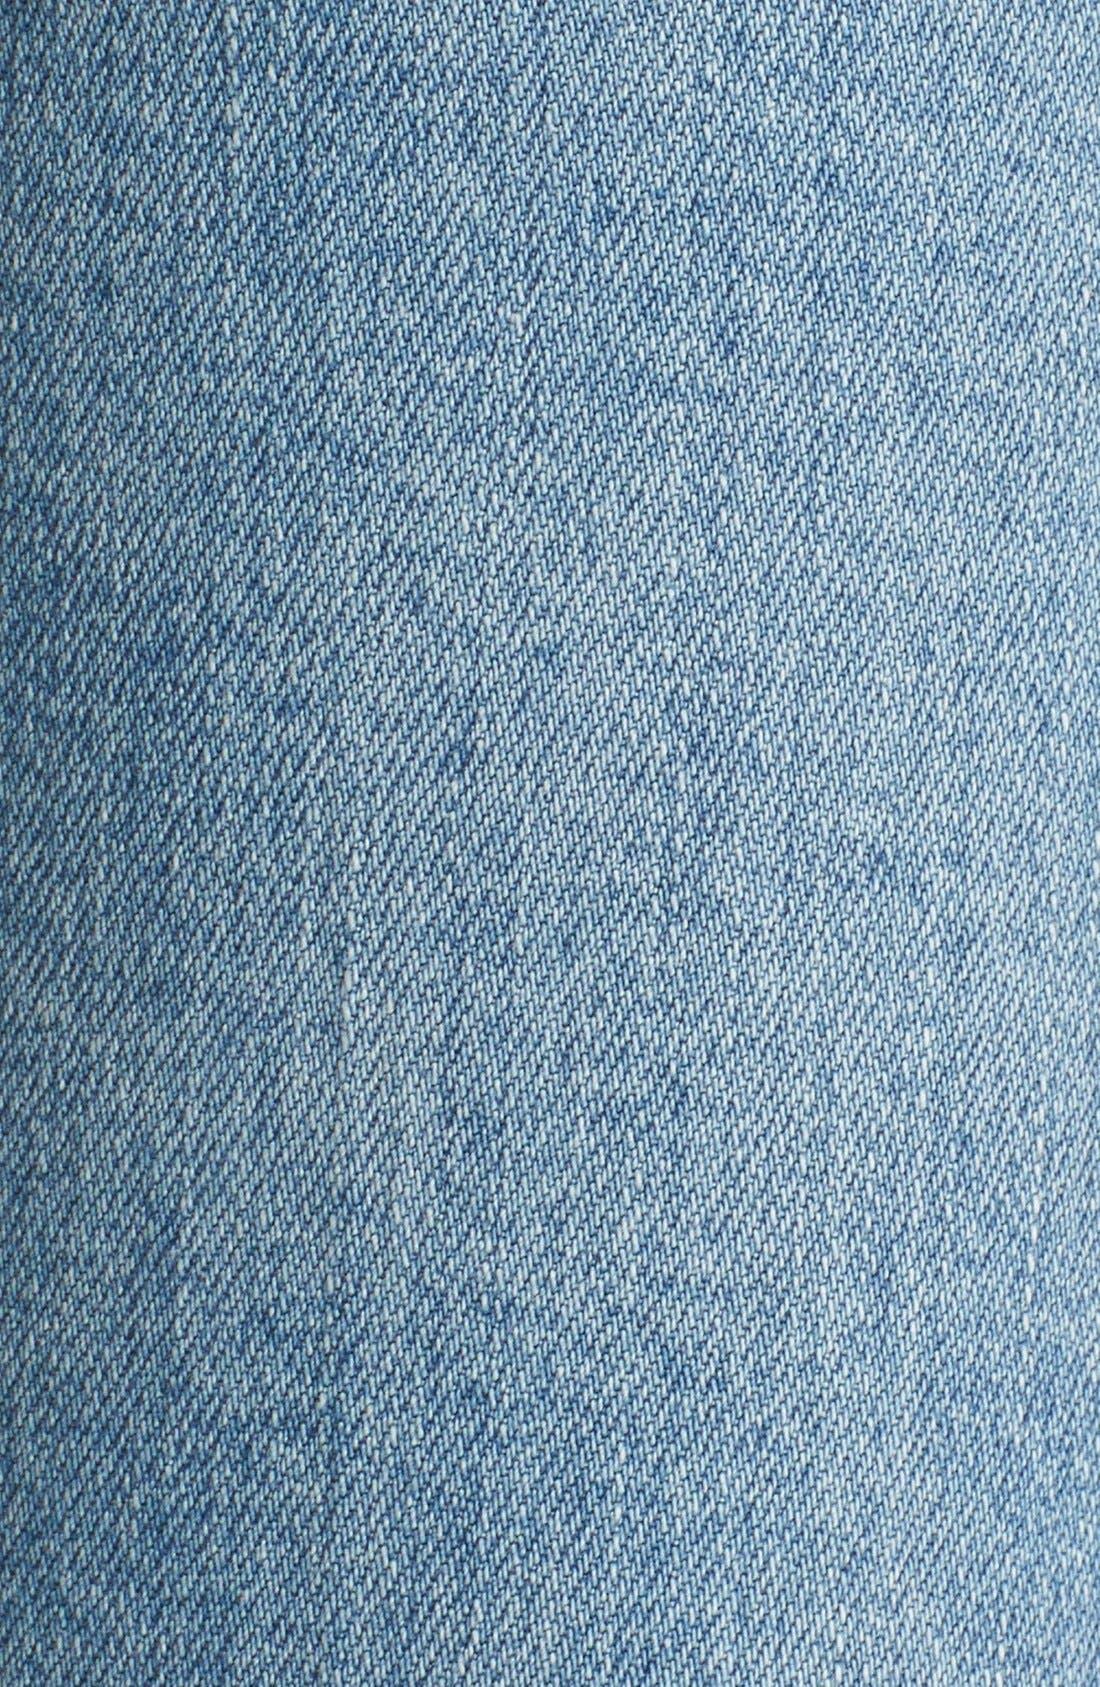 Alternate Image 5  - Stella McCartney Ankle Grazer Skinny Jeans